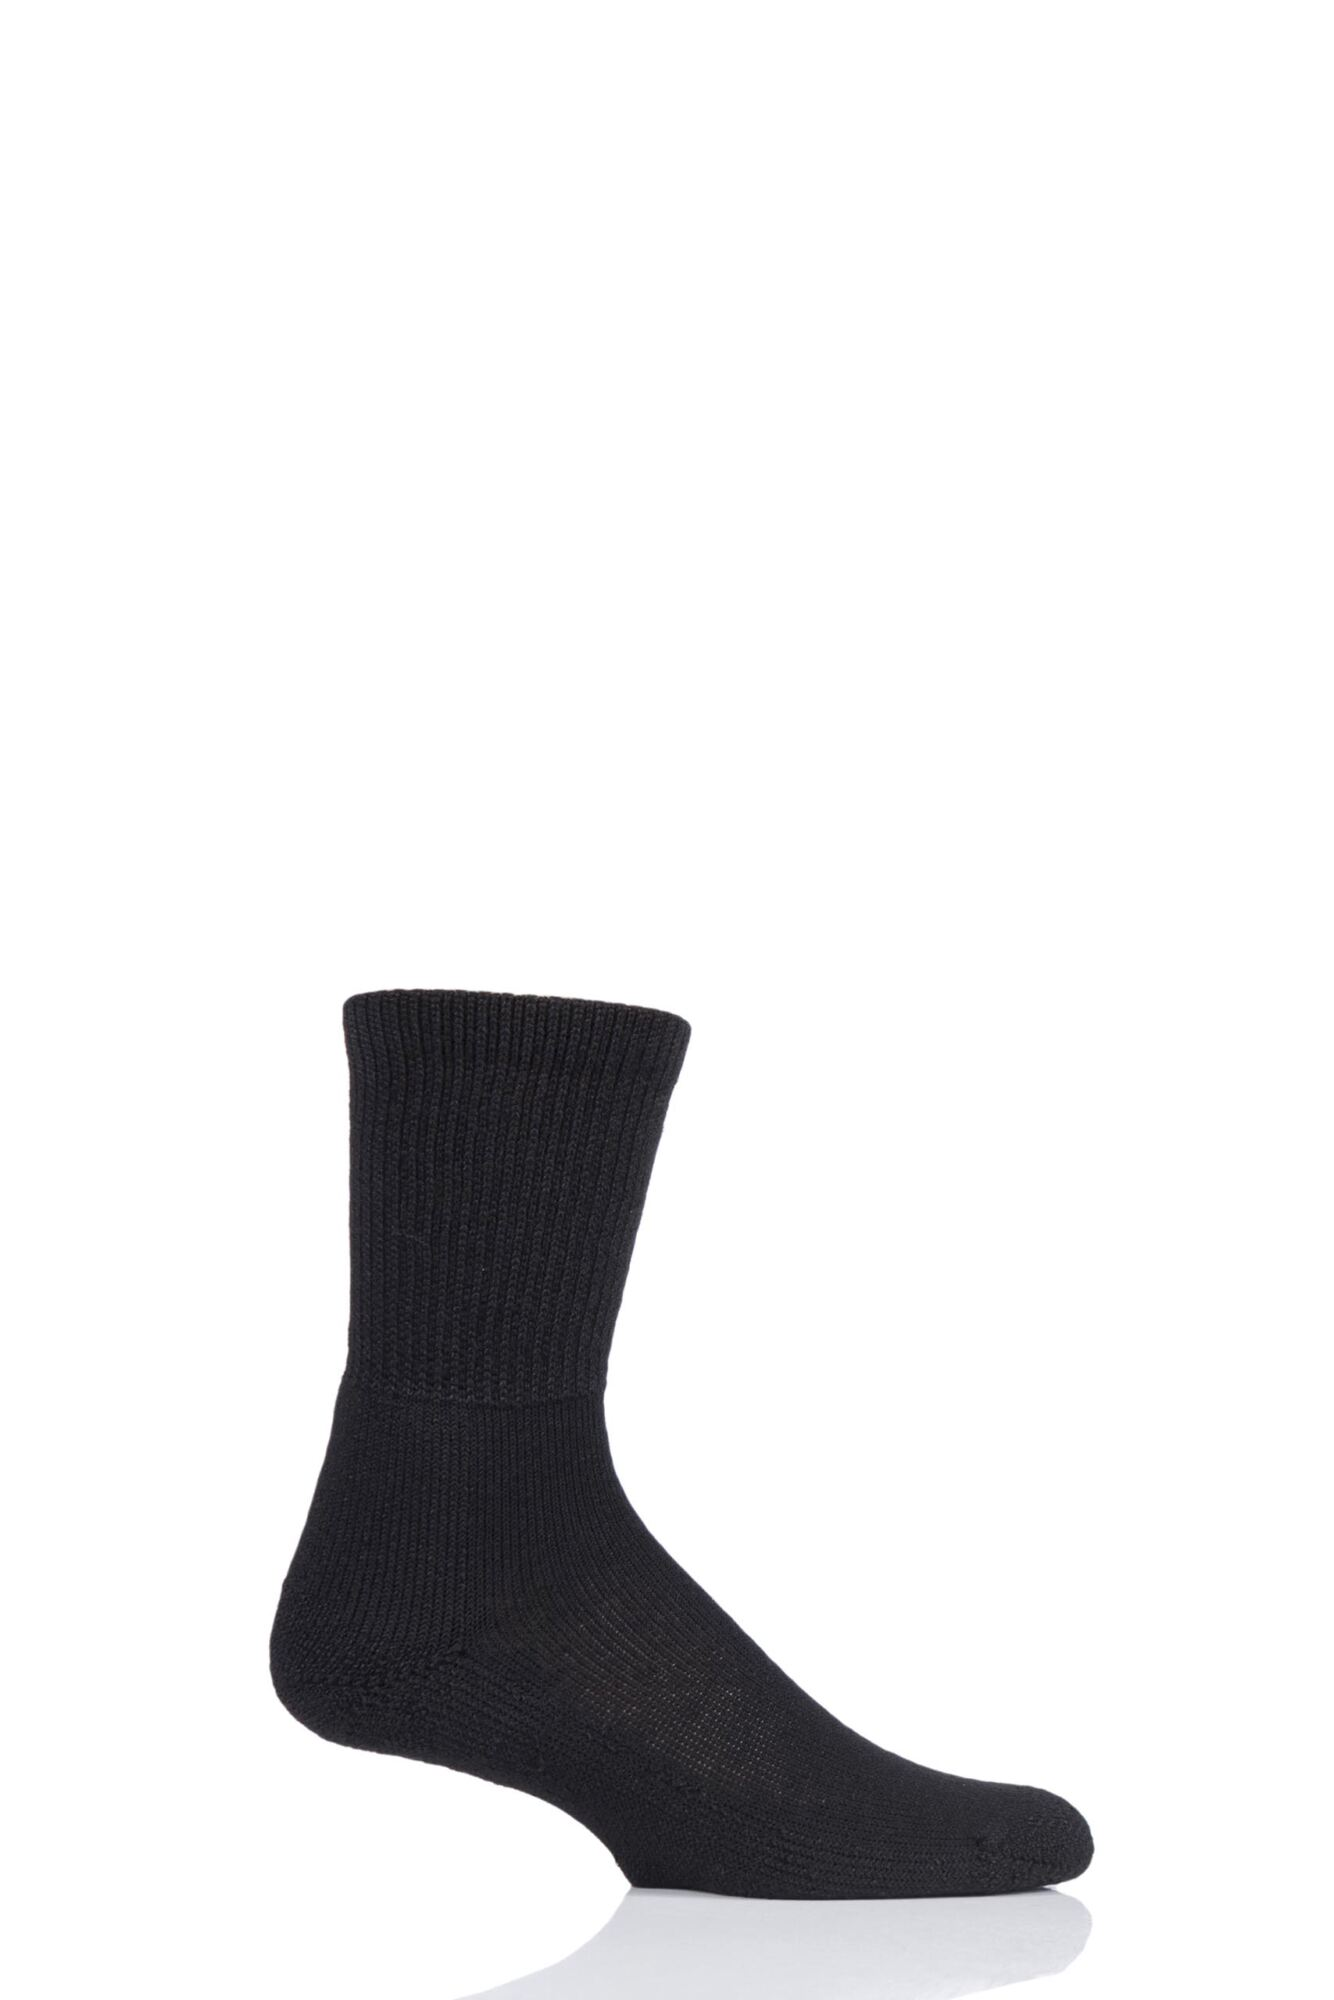 1 Pair Tennis Crew Socks with Thick Cushion Unisex - Thorlos